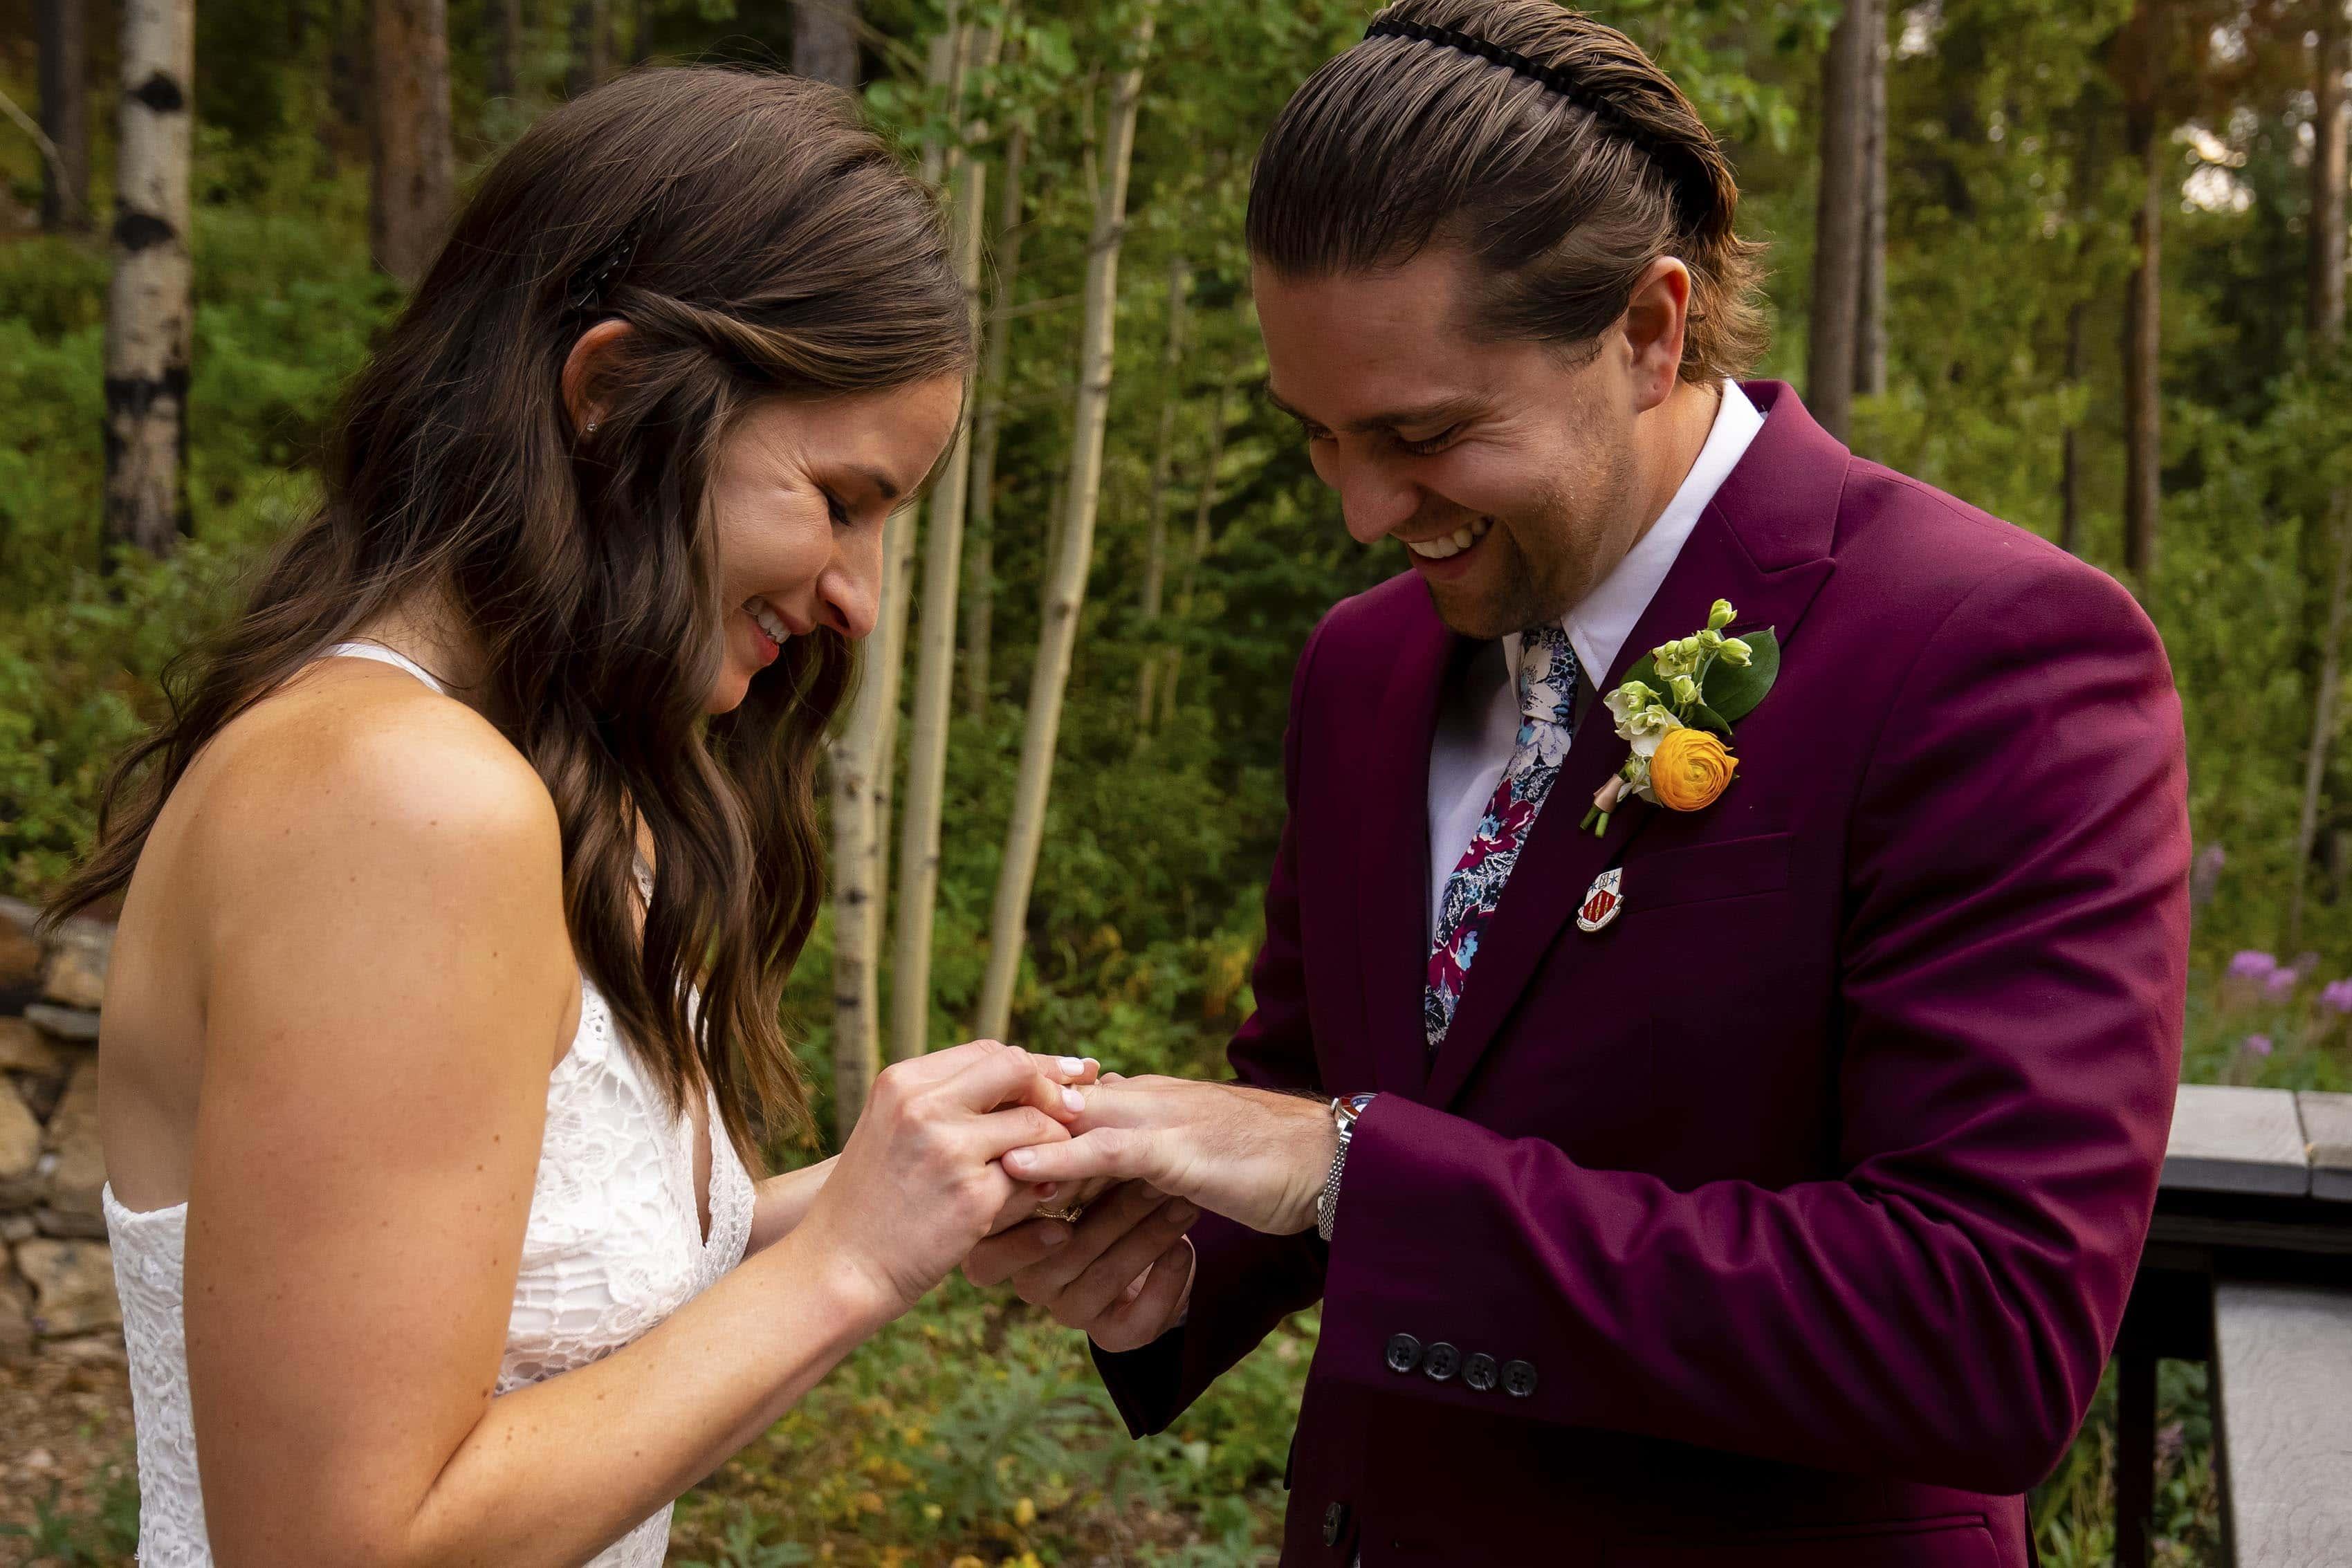 Marla puts on Chris' ring